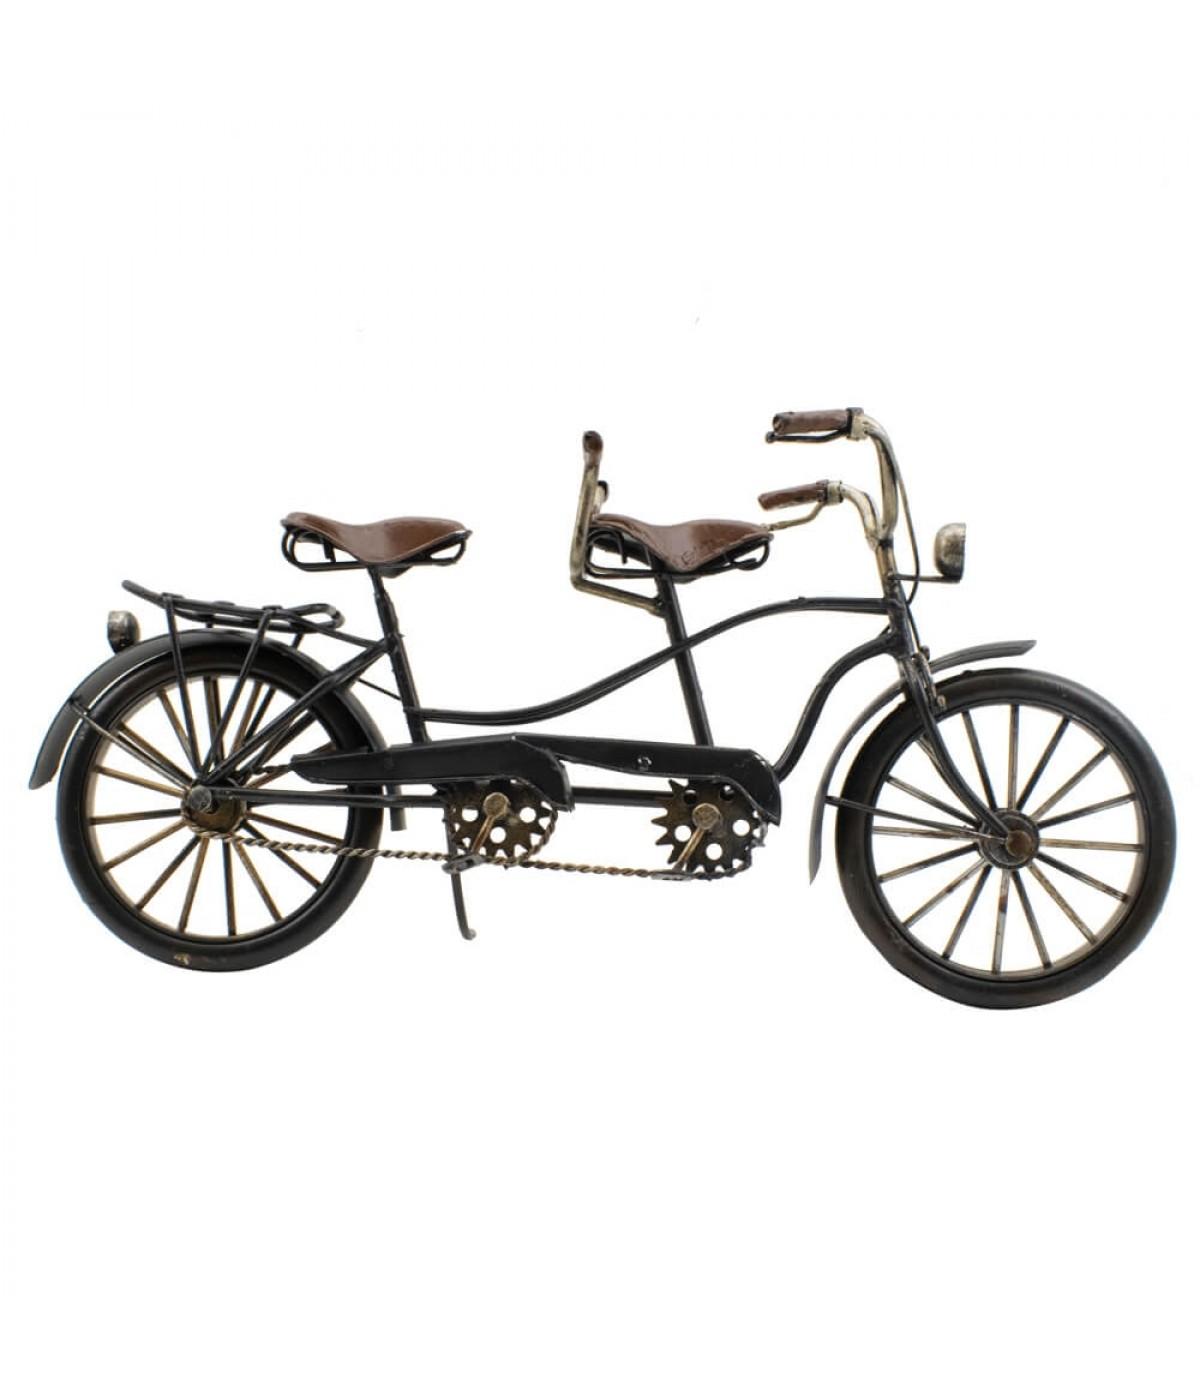 Bicicleta Preta 2 Lugares 30cm Estilo Retrô - Vintage